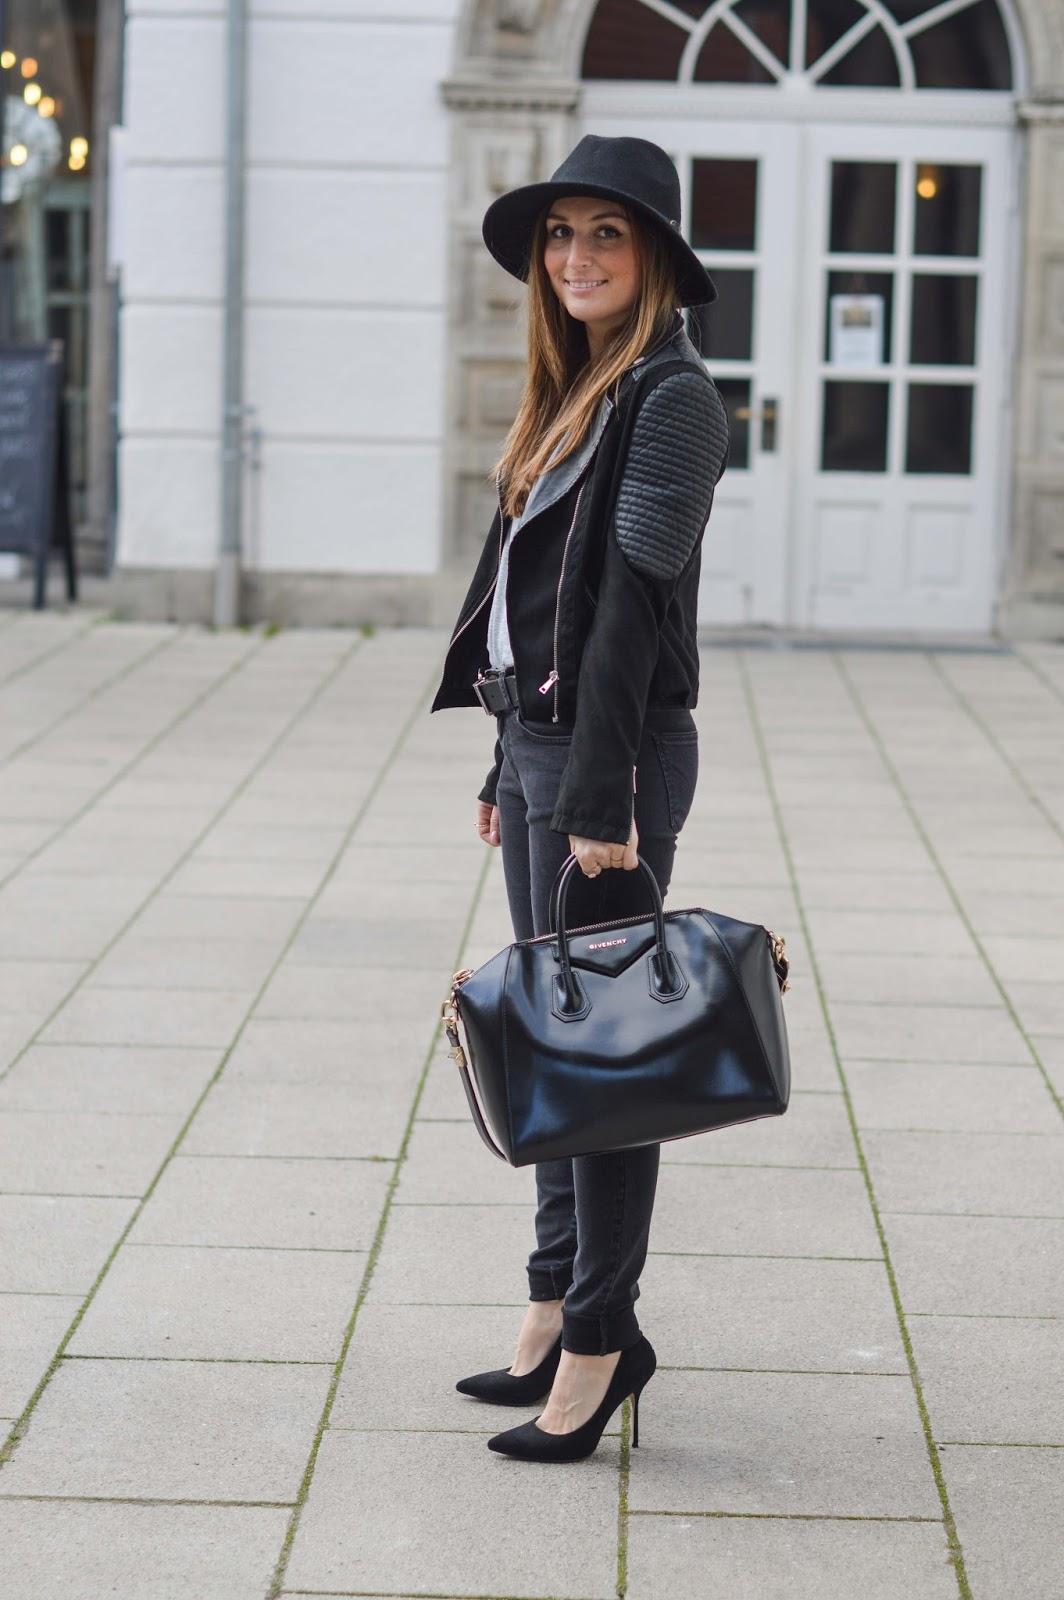 Deutsche Modeblogger - Fashionblogger - Streetstyle - Streetstyleinspiration - About YouWestern Gürtel - High Waist Hose -